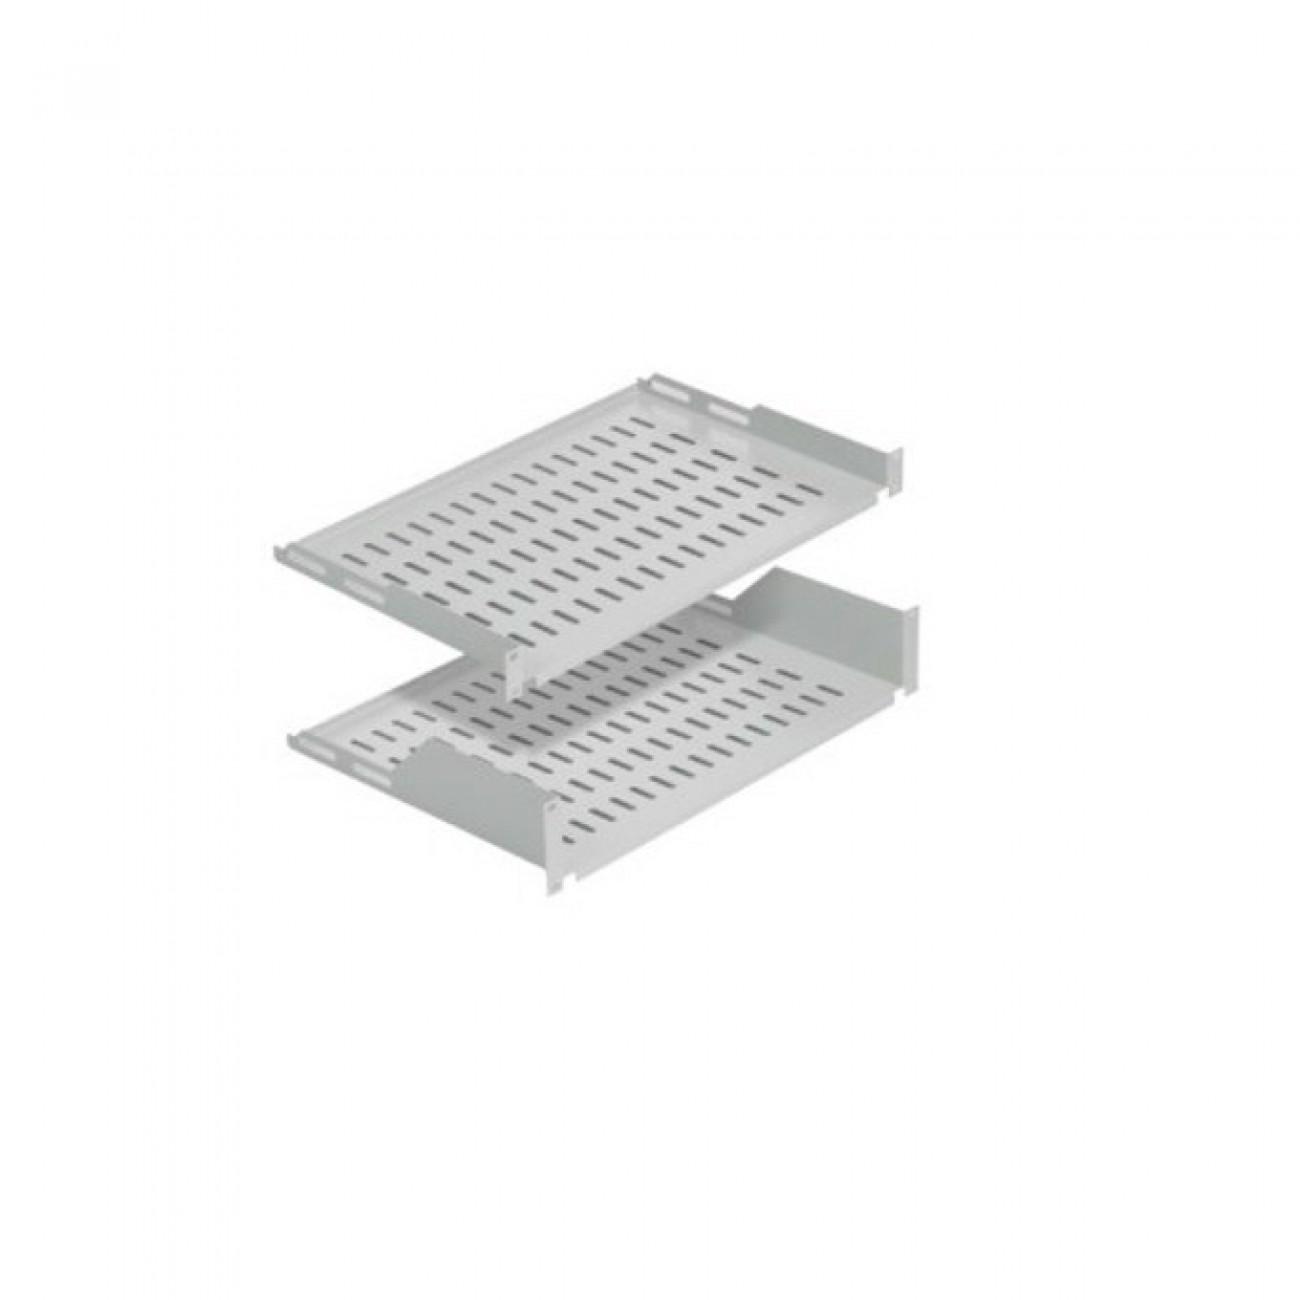 Тава Mirsan MR.RAK1U25, 19, 1U, за комуникационен шкаф, 486x250x44мм, 30кг товароносимост, сива в Мрежови шкафове - Mirsan | Alleop